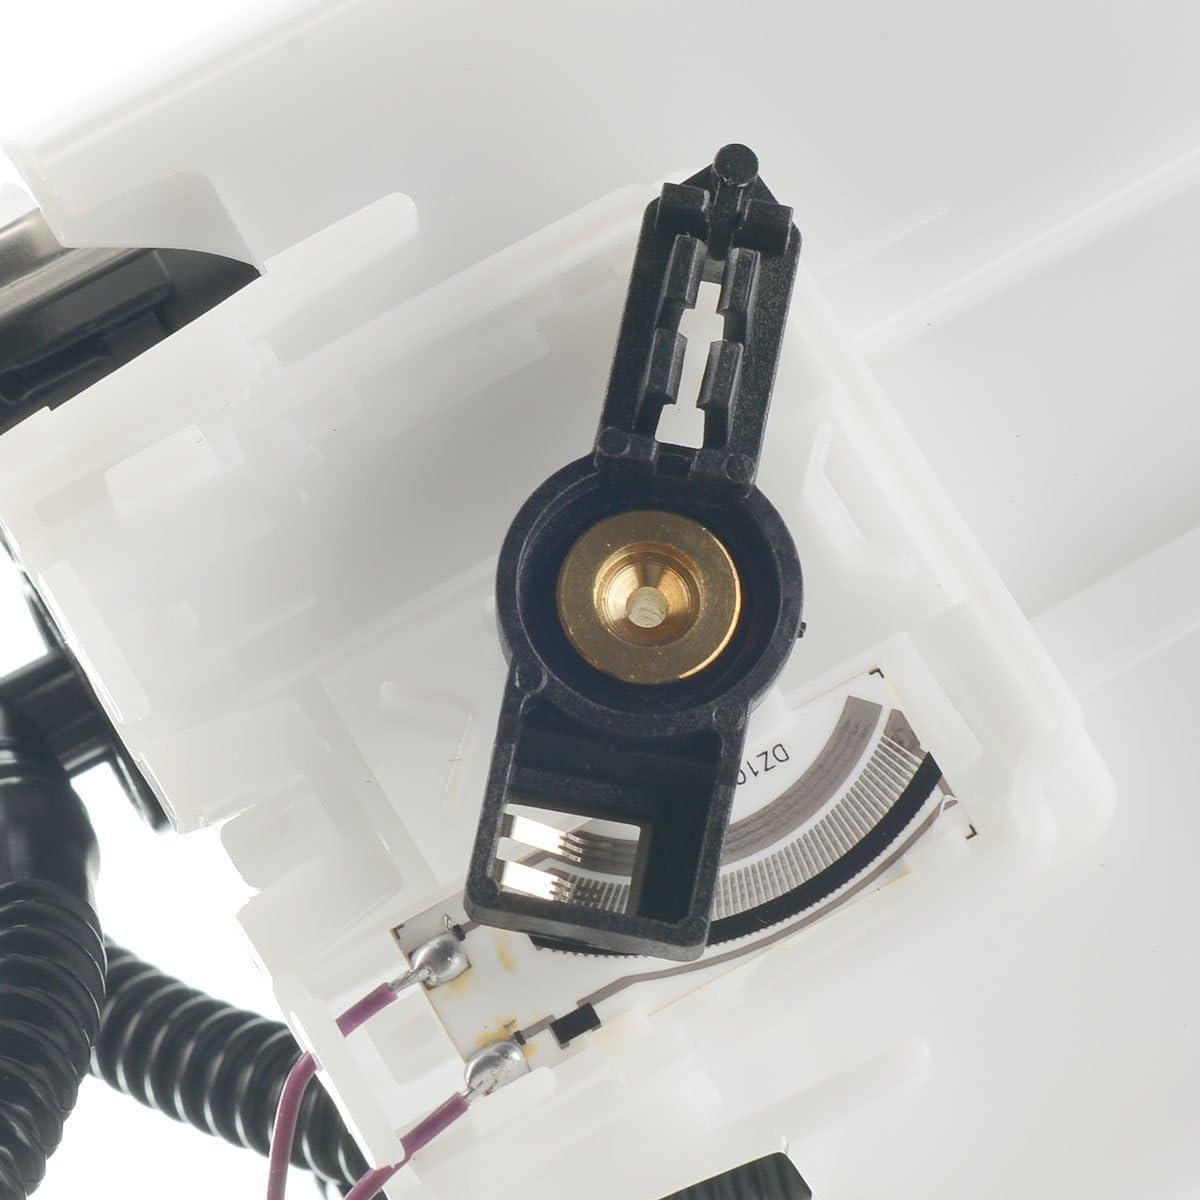 Fuel Pump Assembly with Pressure Sensor for Chevrolet Silverado/1500 2500 HD GMC Sierra